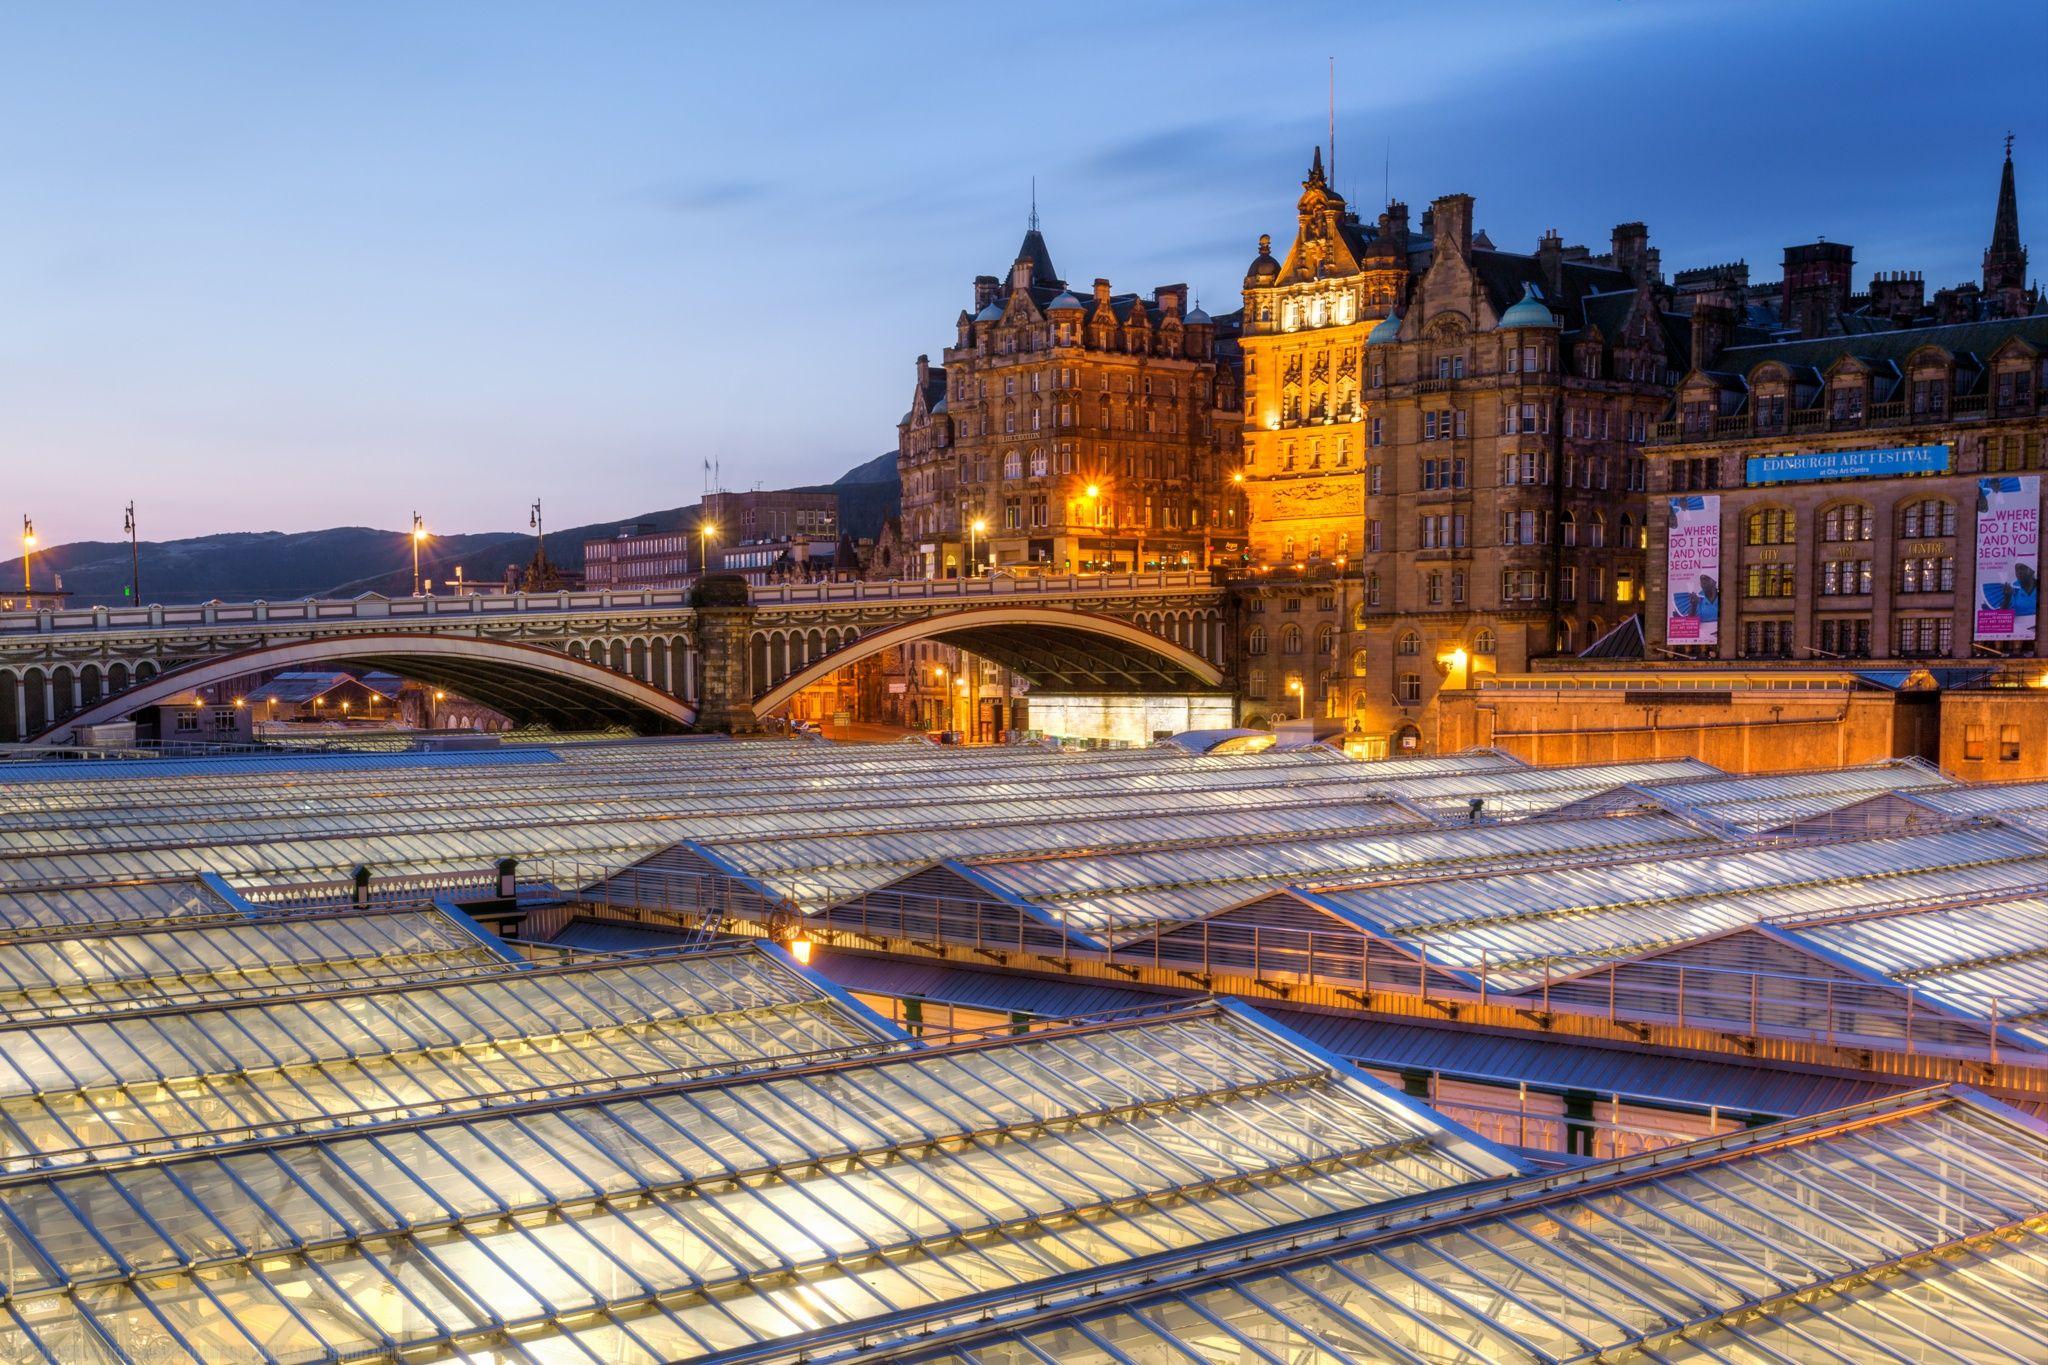 Edinburgh Waverley Station, Edinburgh, Scotland by Joe Daniel Price on 500px